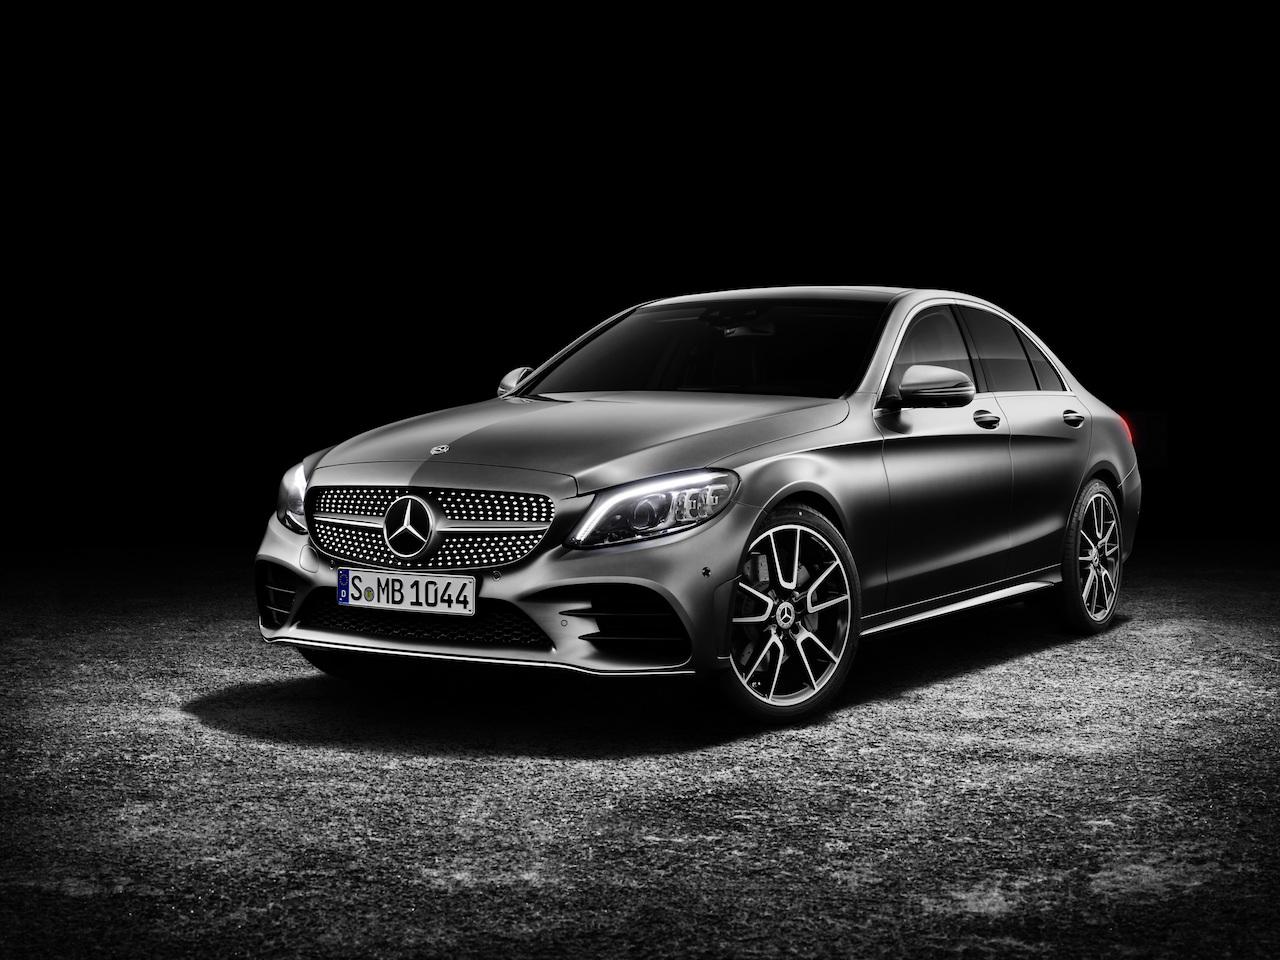 Mercedes-Benz C 200 Progressive launched at Rs. 43.46 lakh